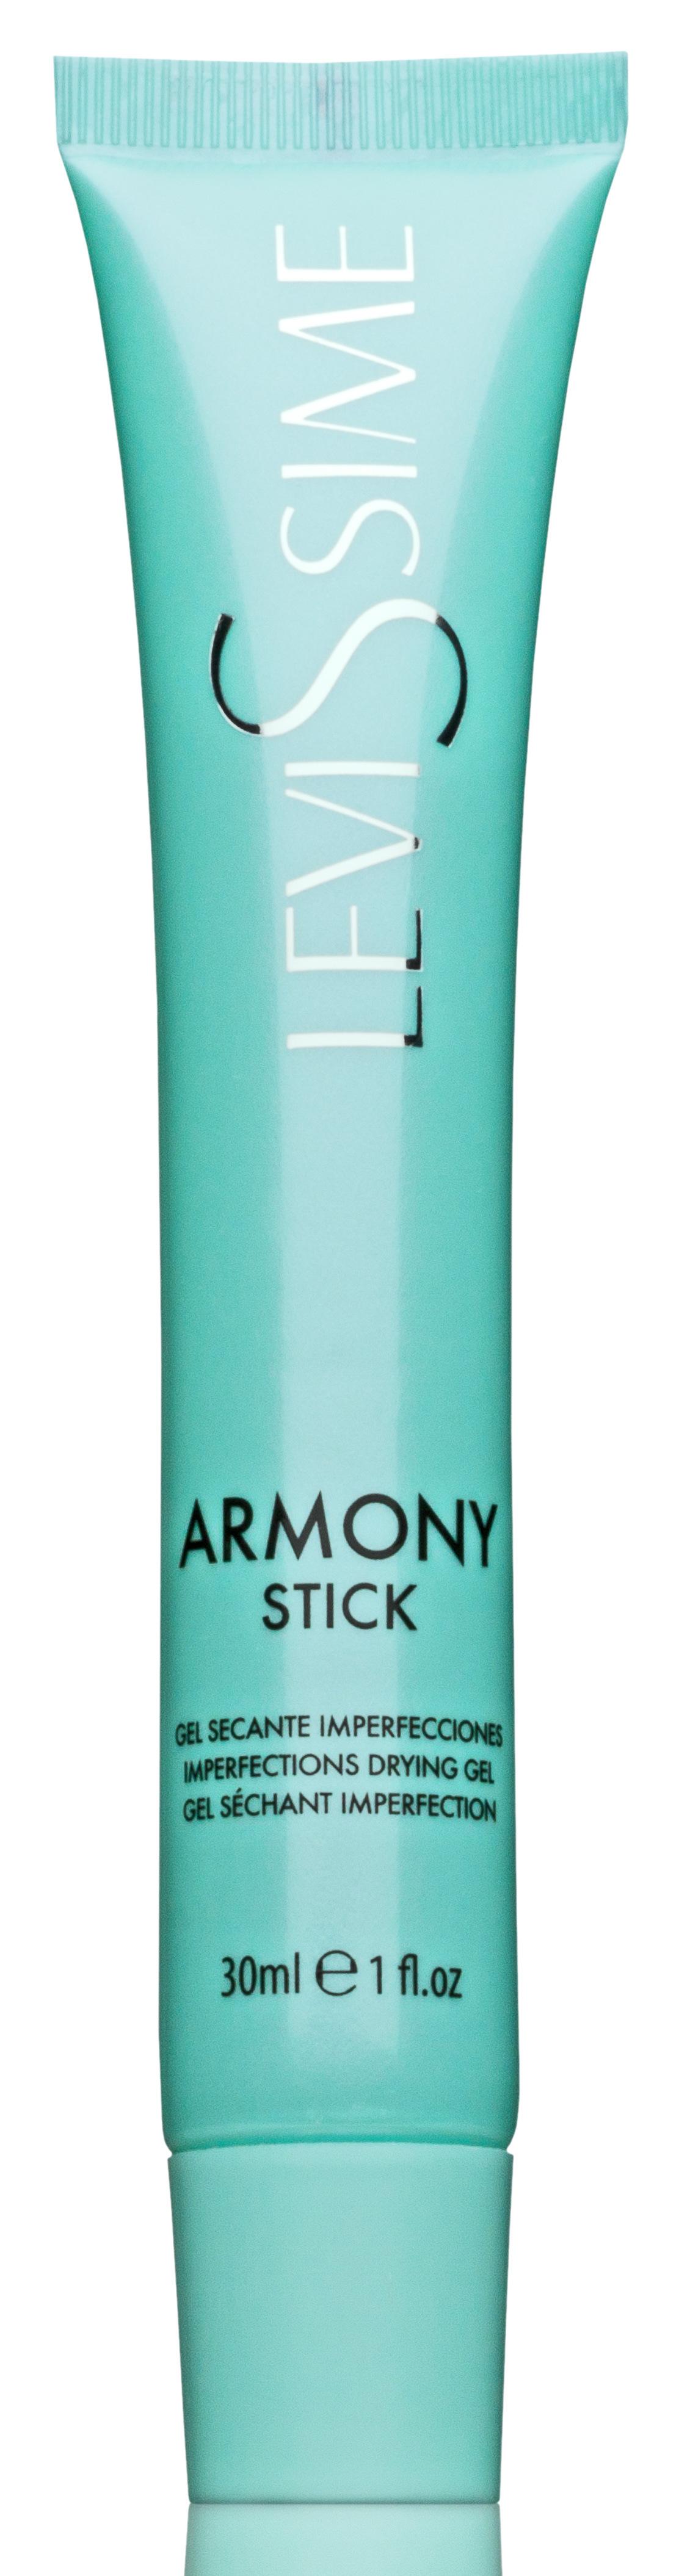 LEVISSIME Корректор для проблемной кожи / Armony Stick 30 мл - Гели